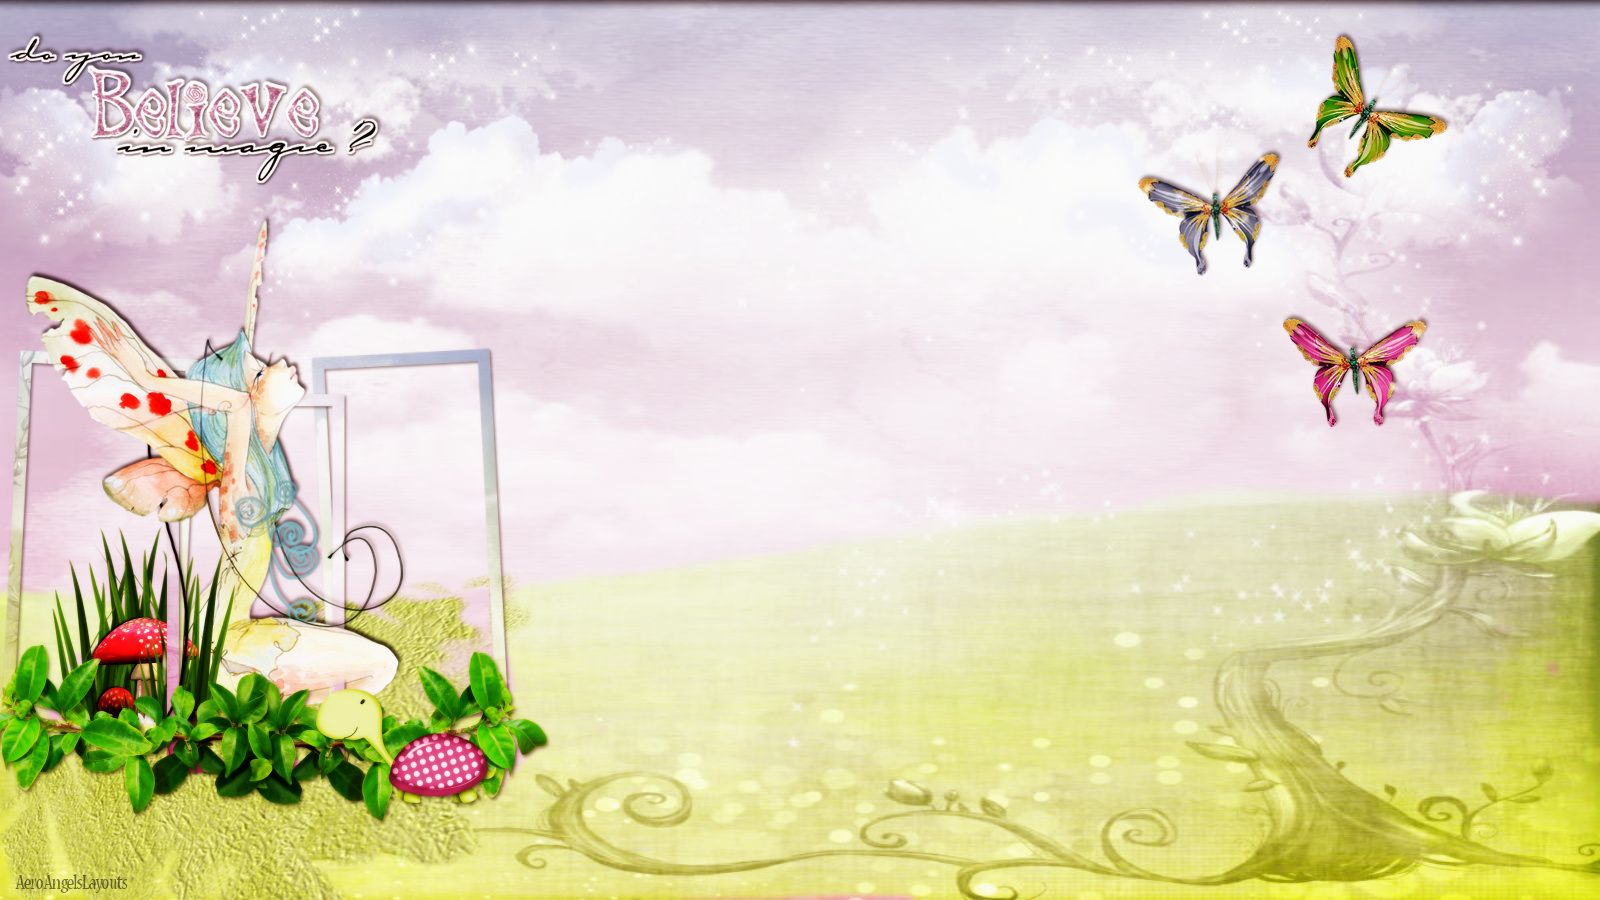 Imagenes Lindas Para Fondo De Pantalla Animada: Dibujo Fondo Animado - Buscar Con Google